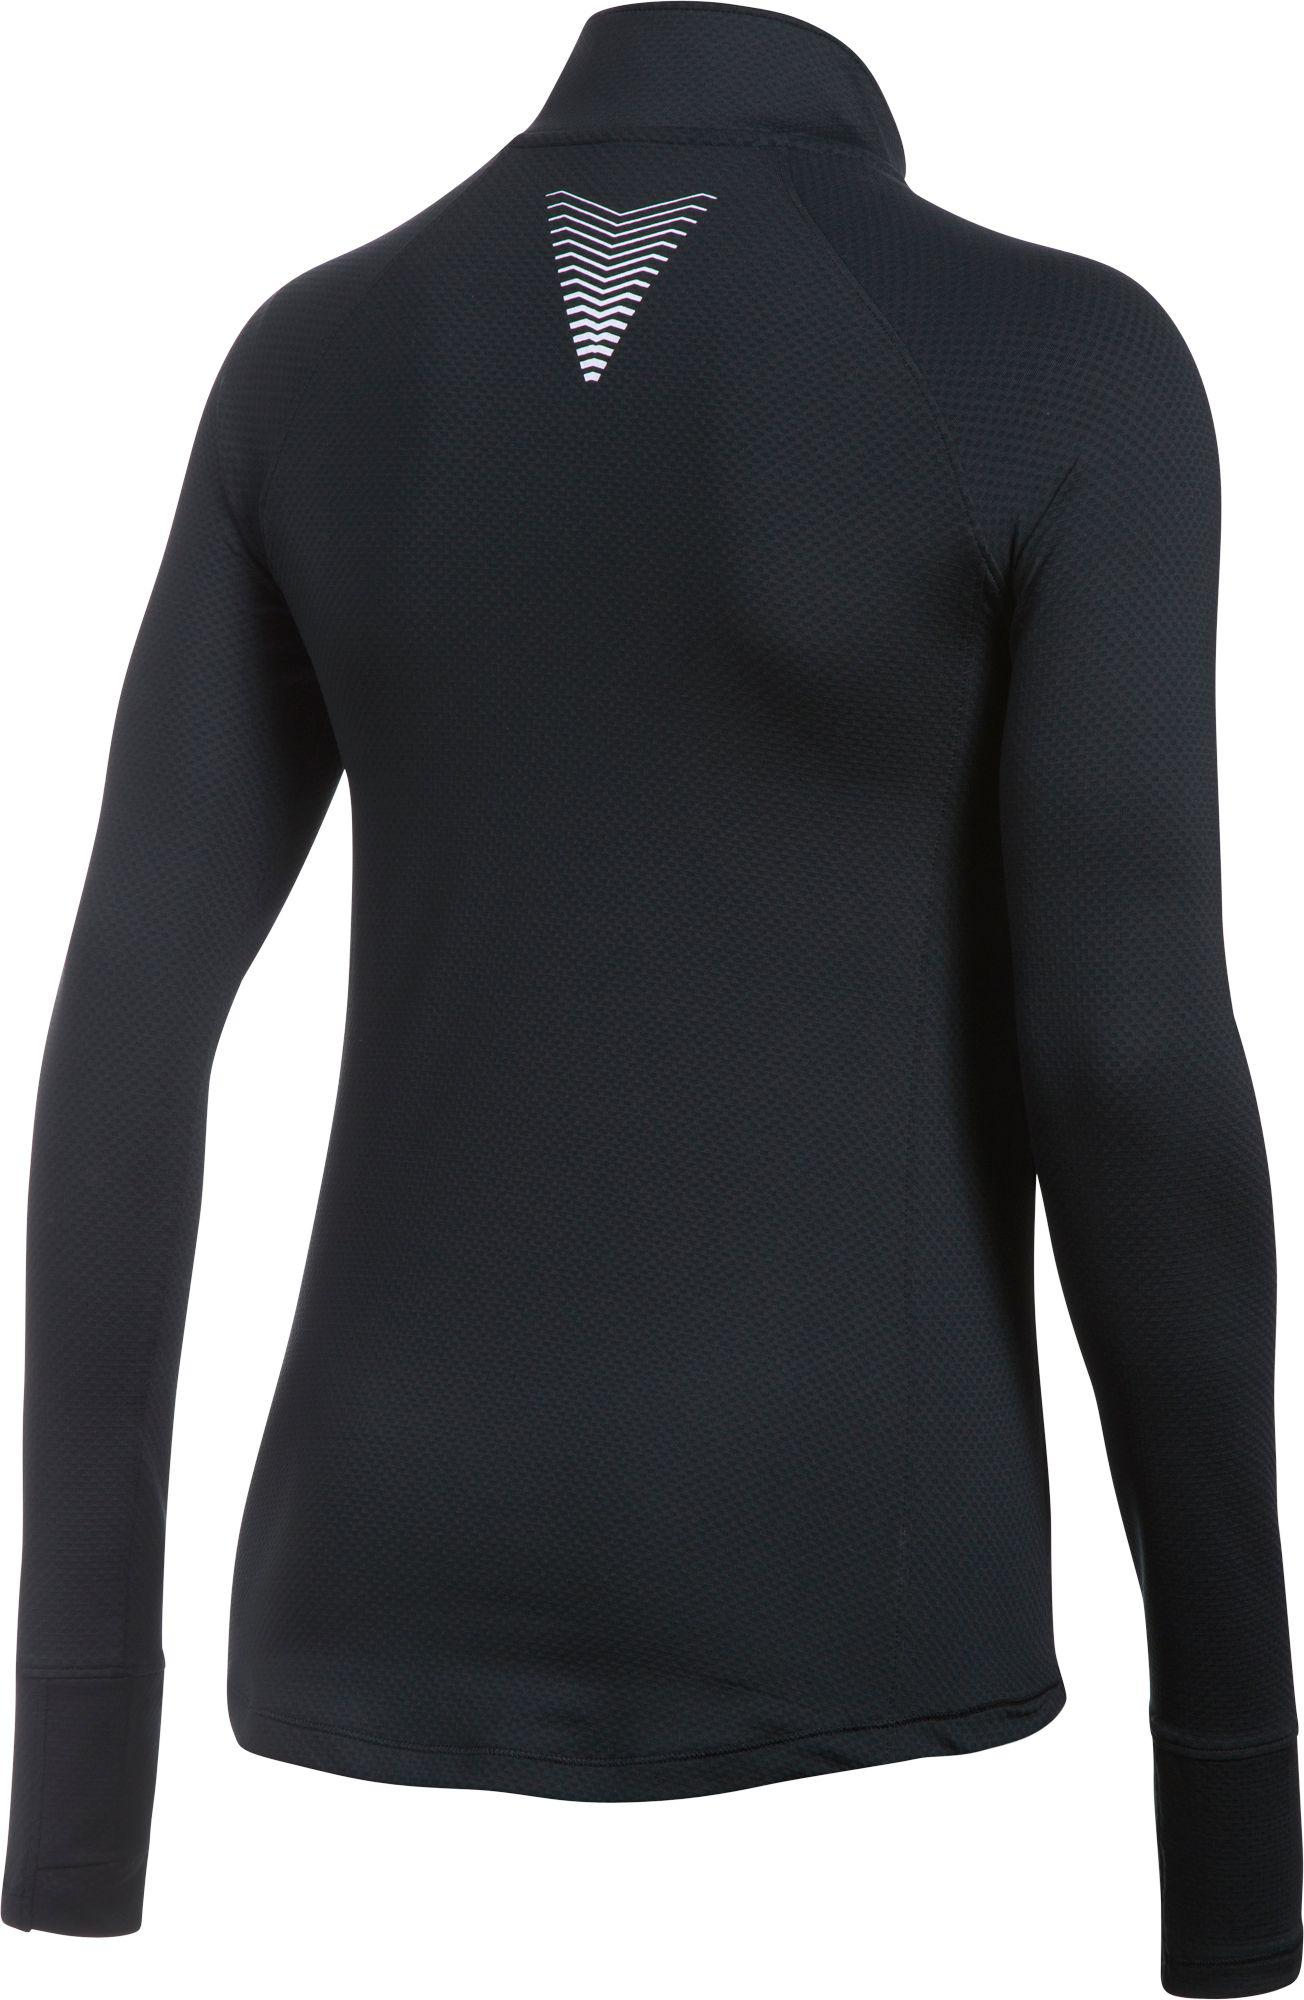 03f997b5 Under Armour Coldgear Reactor 1/2 Zip Long Sleeve T-shirt in Black ...